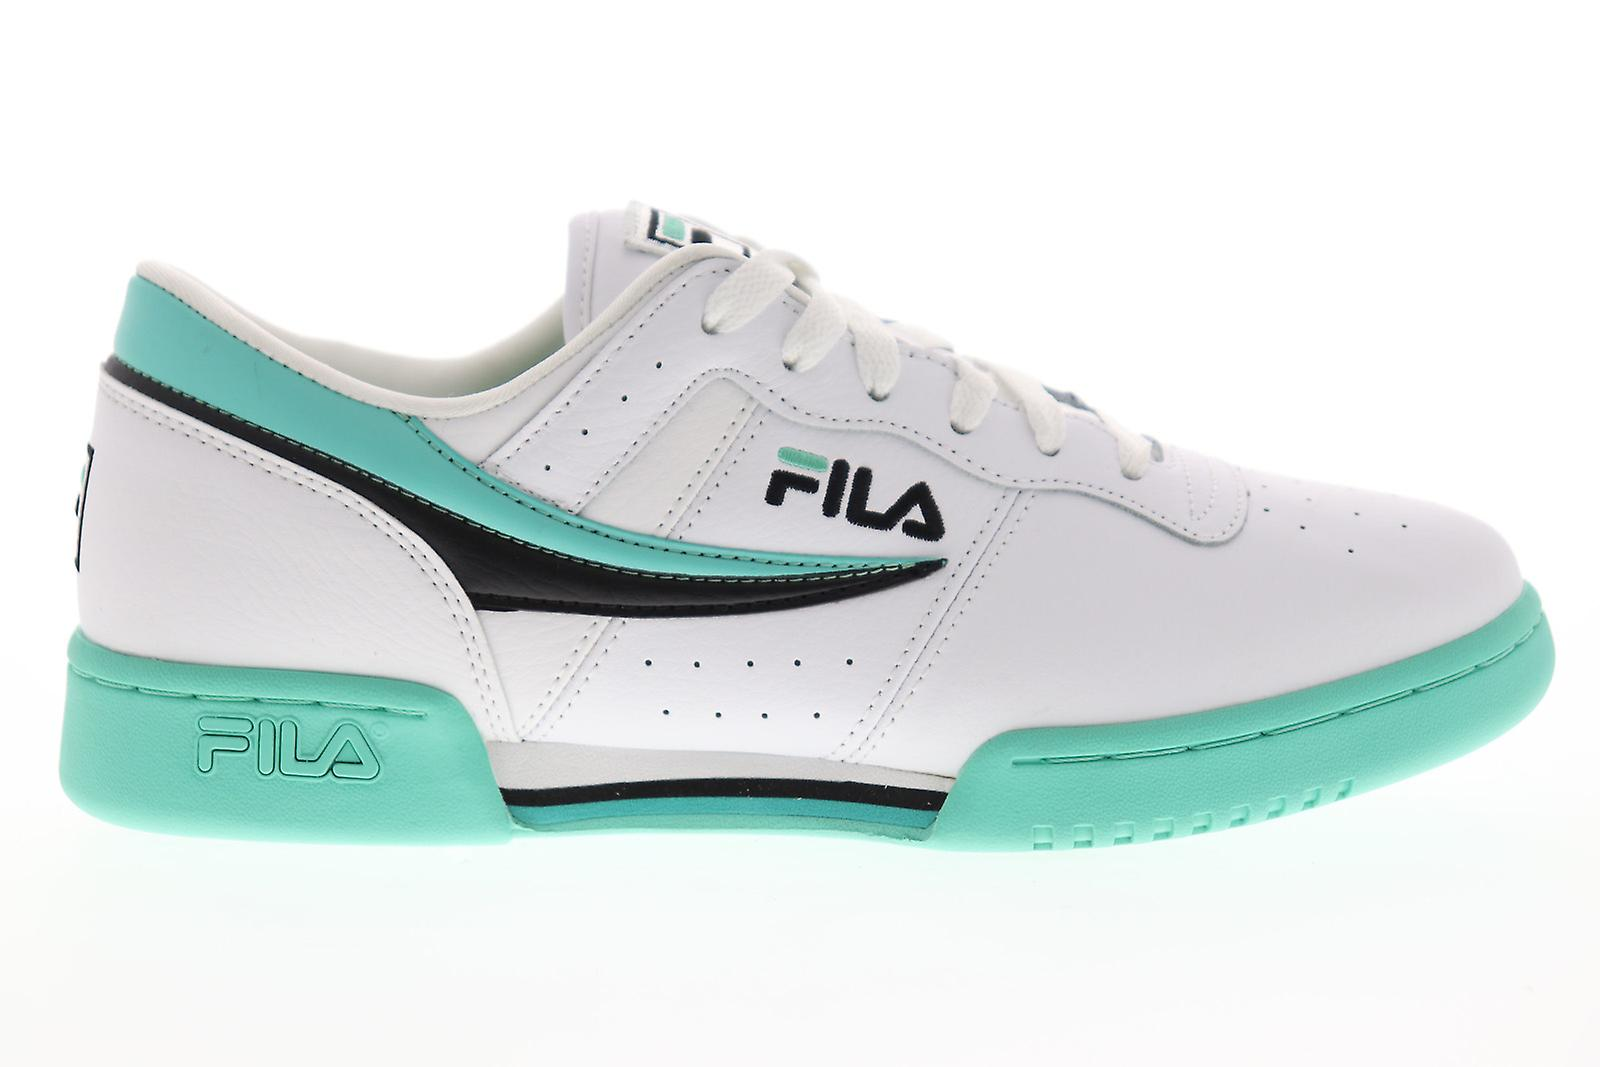 Fila original fitness menns hvit casual lav topp joggesko sko